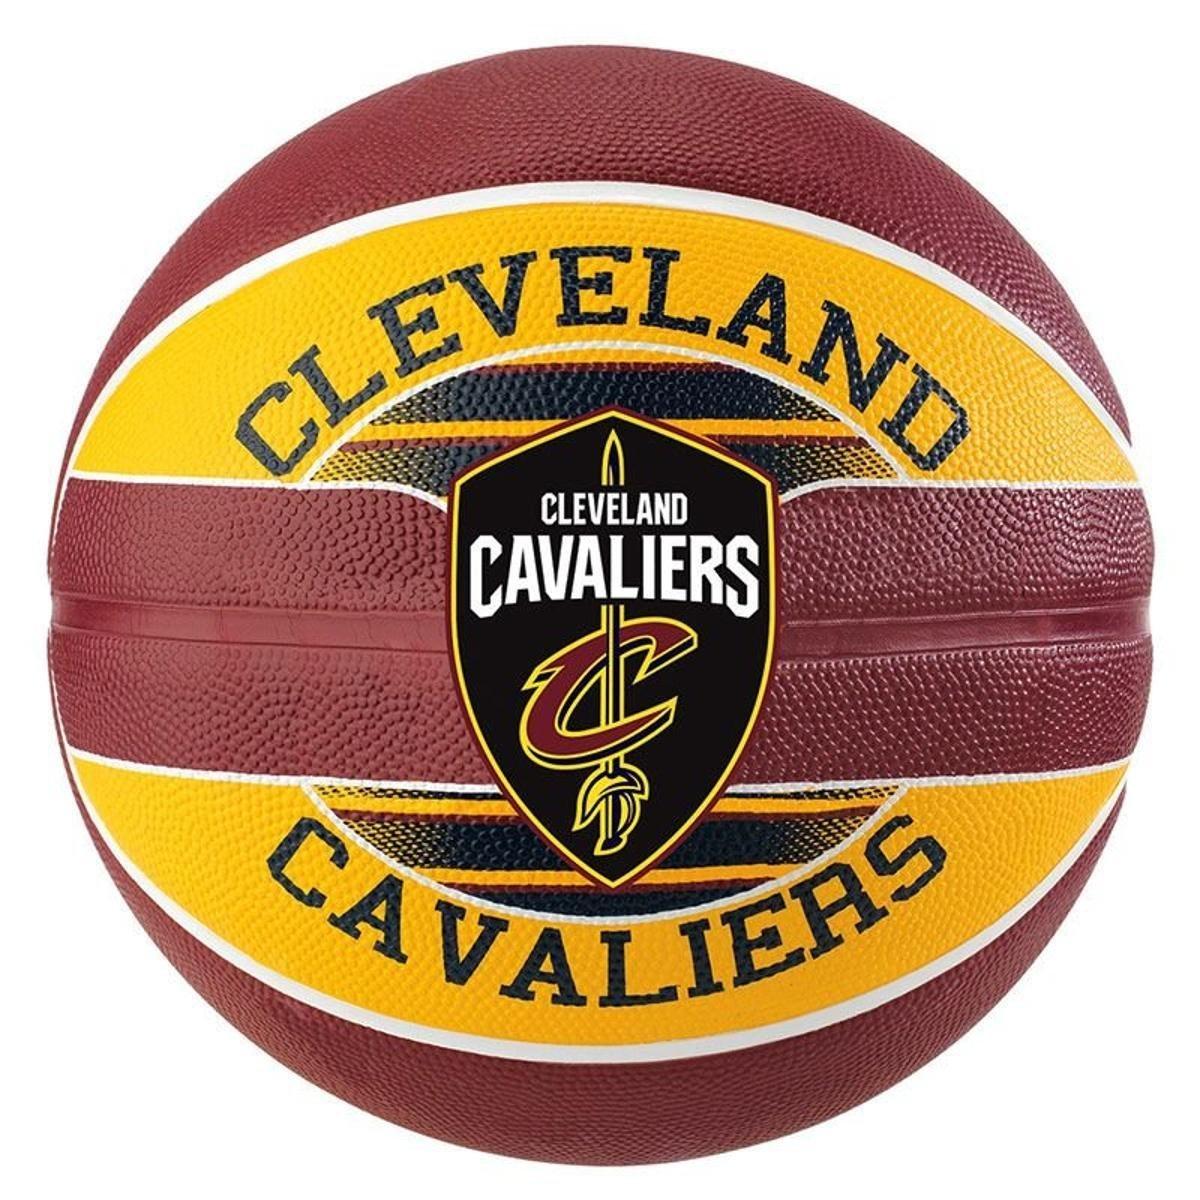 Bola do Cleveland Cavaliers